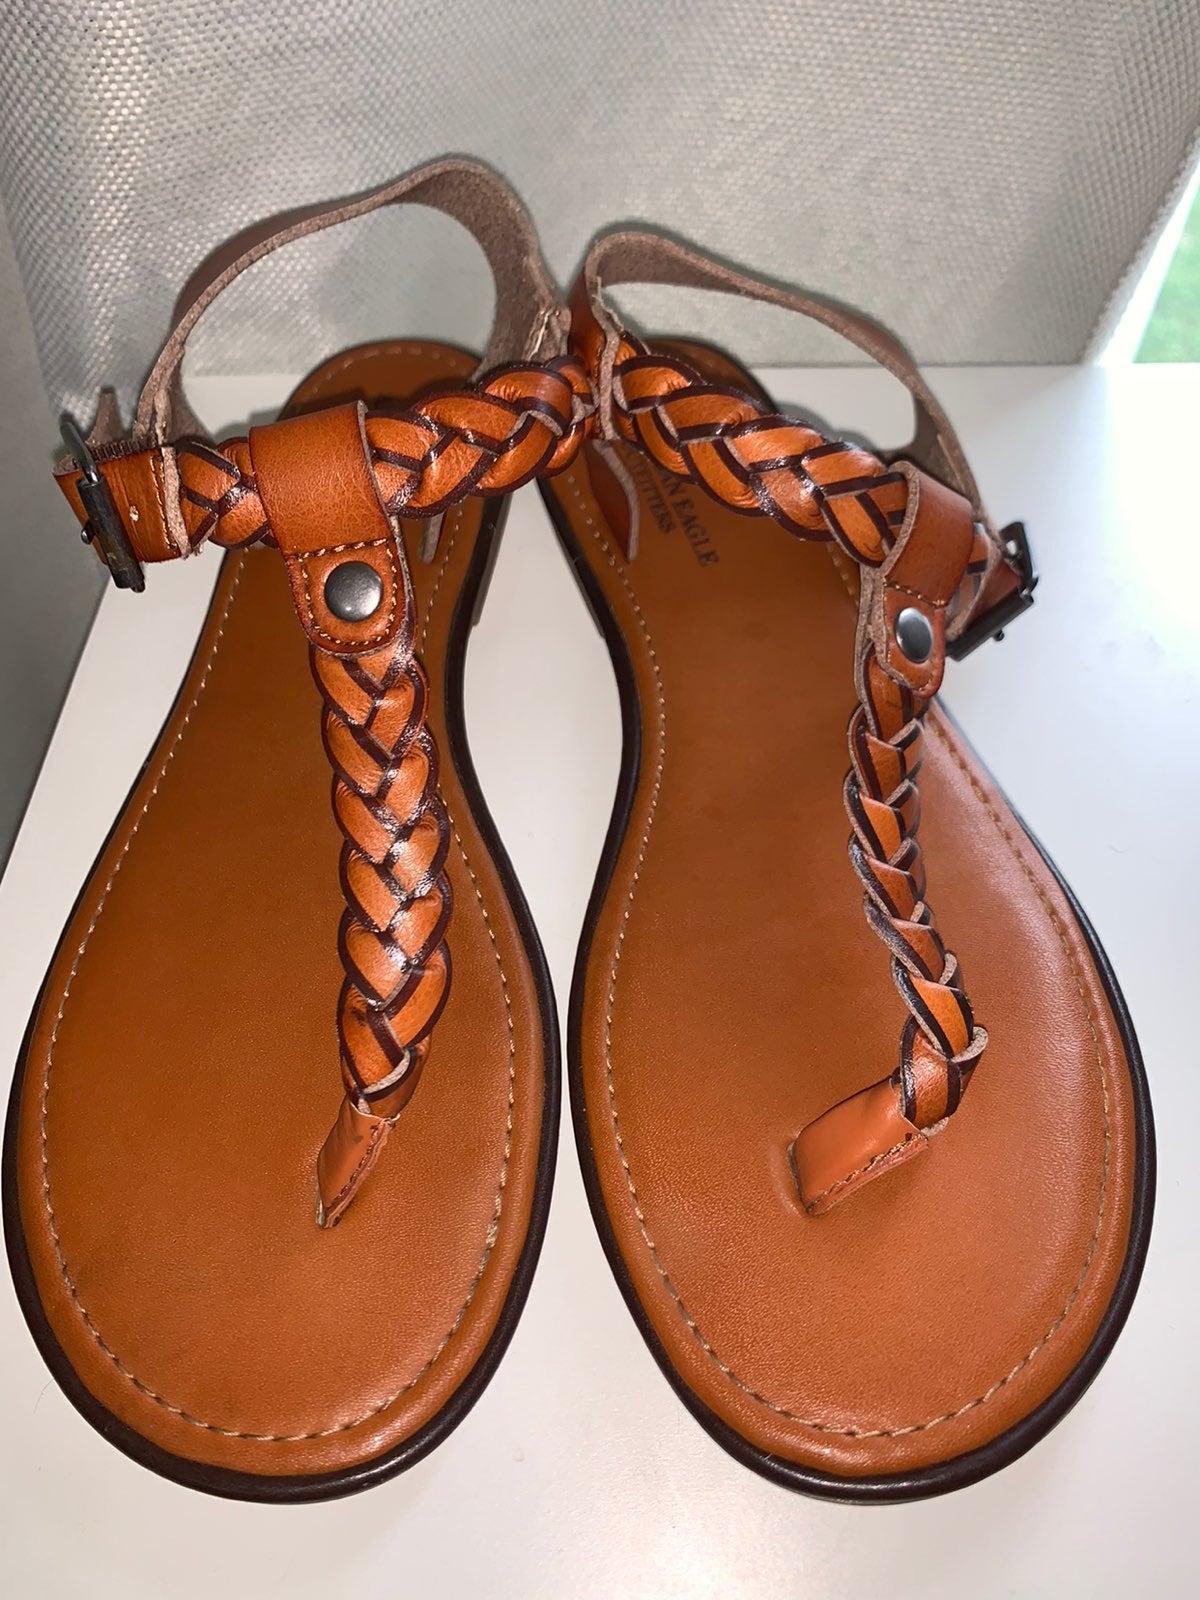 Sandals american eagle